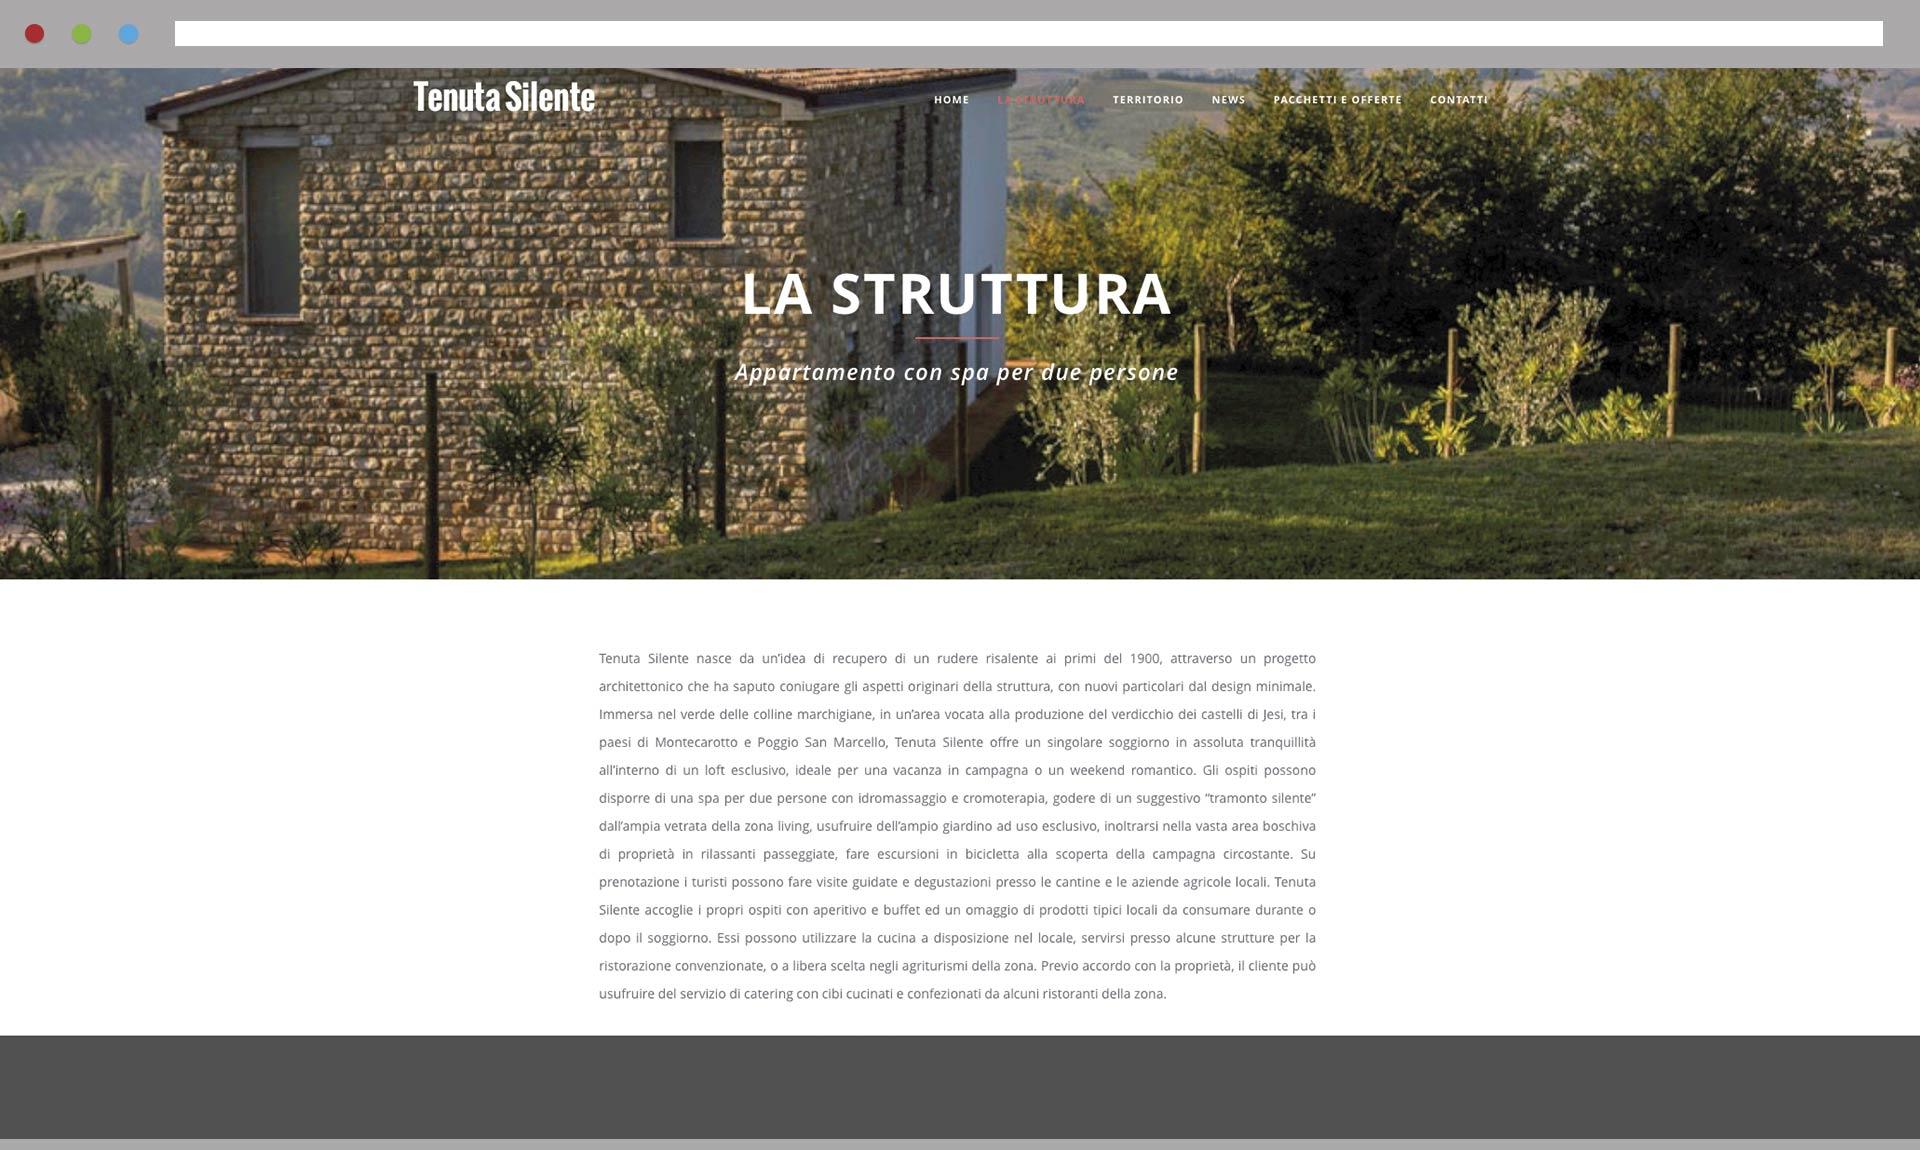 Subwaylab-Sito-Silente-screenshot02